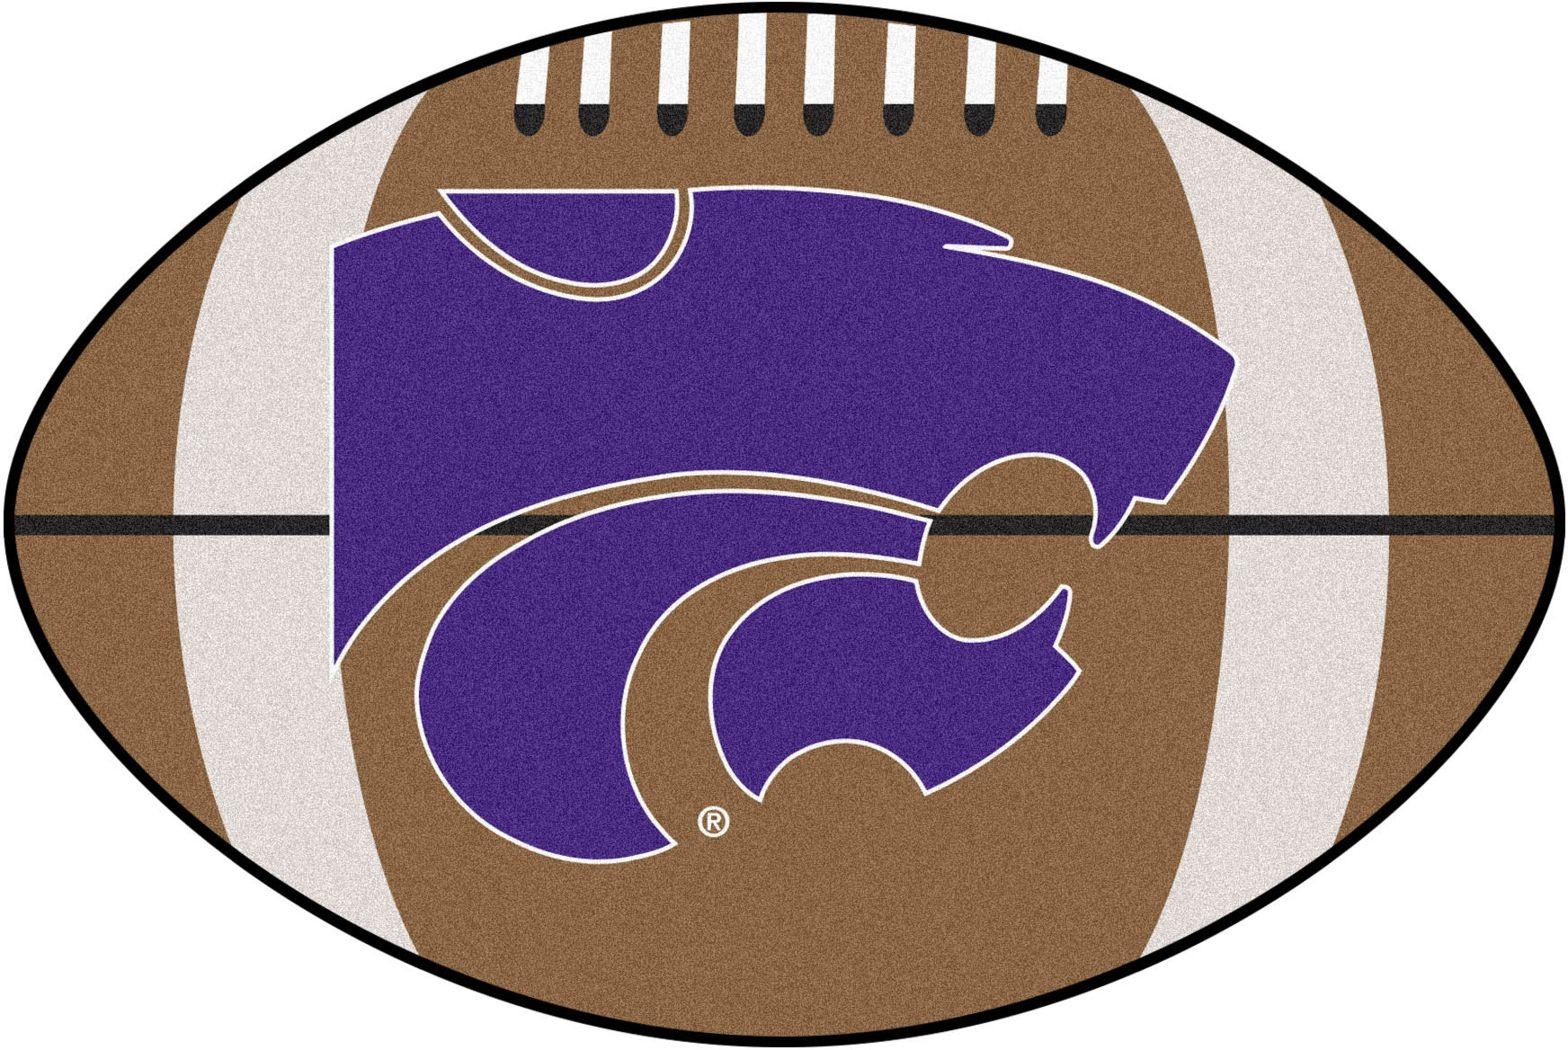 "NCAA Football Mascot Kansas State University 1'6"" x 1'10"" Rug"